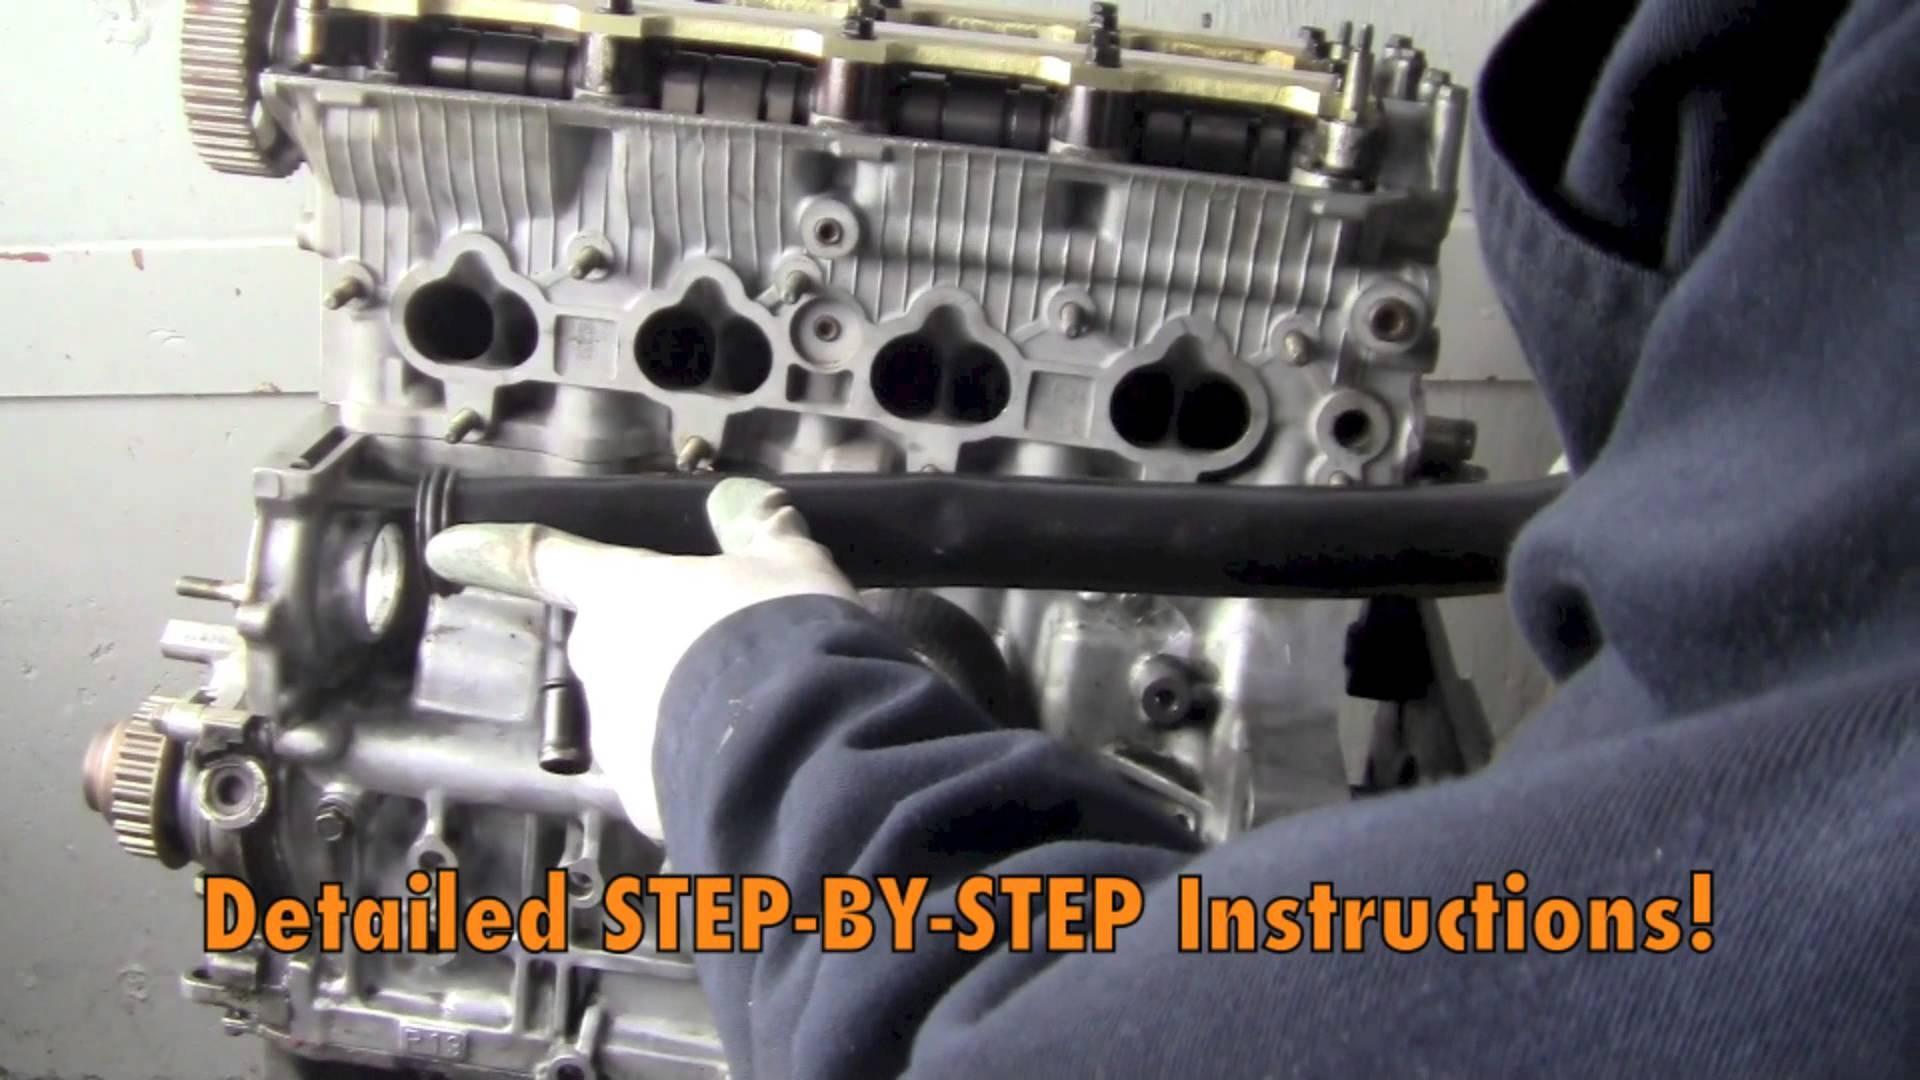 Honda Prelude Engine Diagram How to Rebuild Your Honda Prelude H Series Engine Diy Dvd Of Honda Prelude Engine Diagram